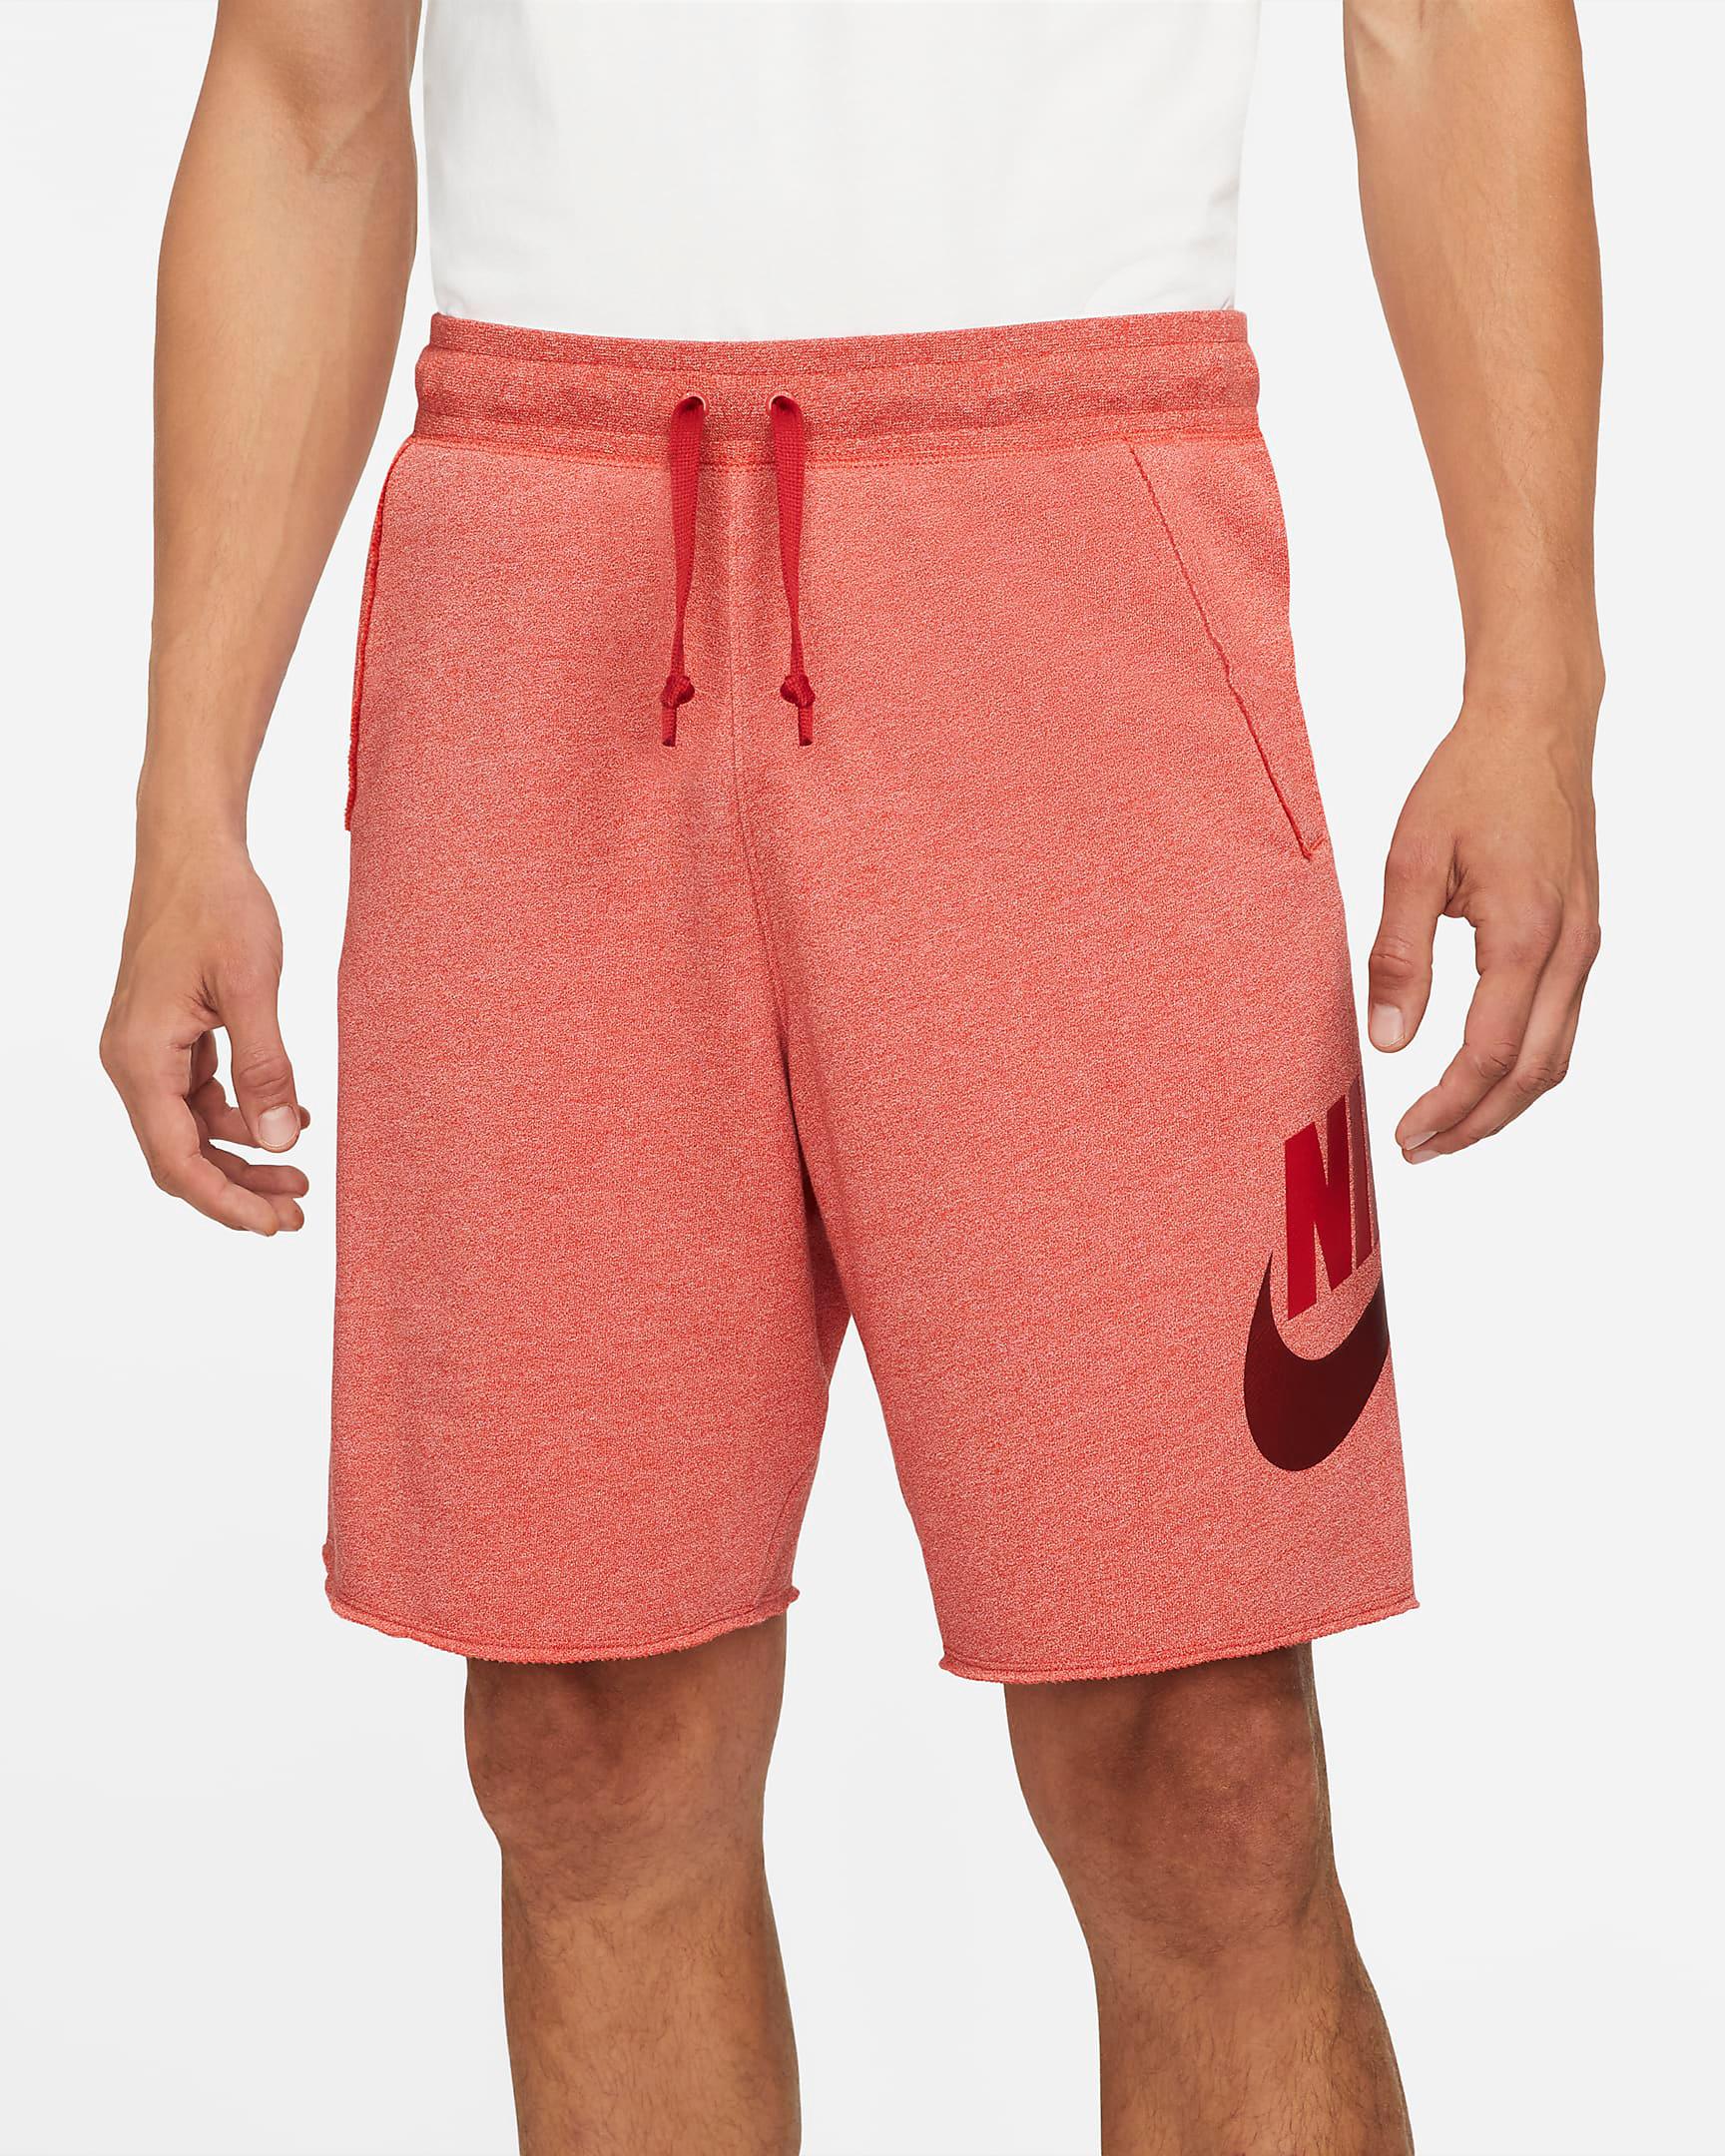 nike-lobster-alumni-shorts-1